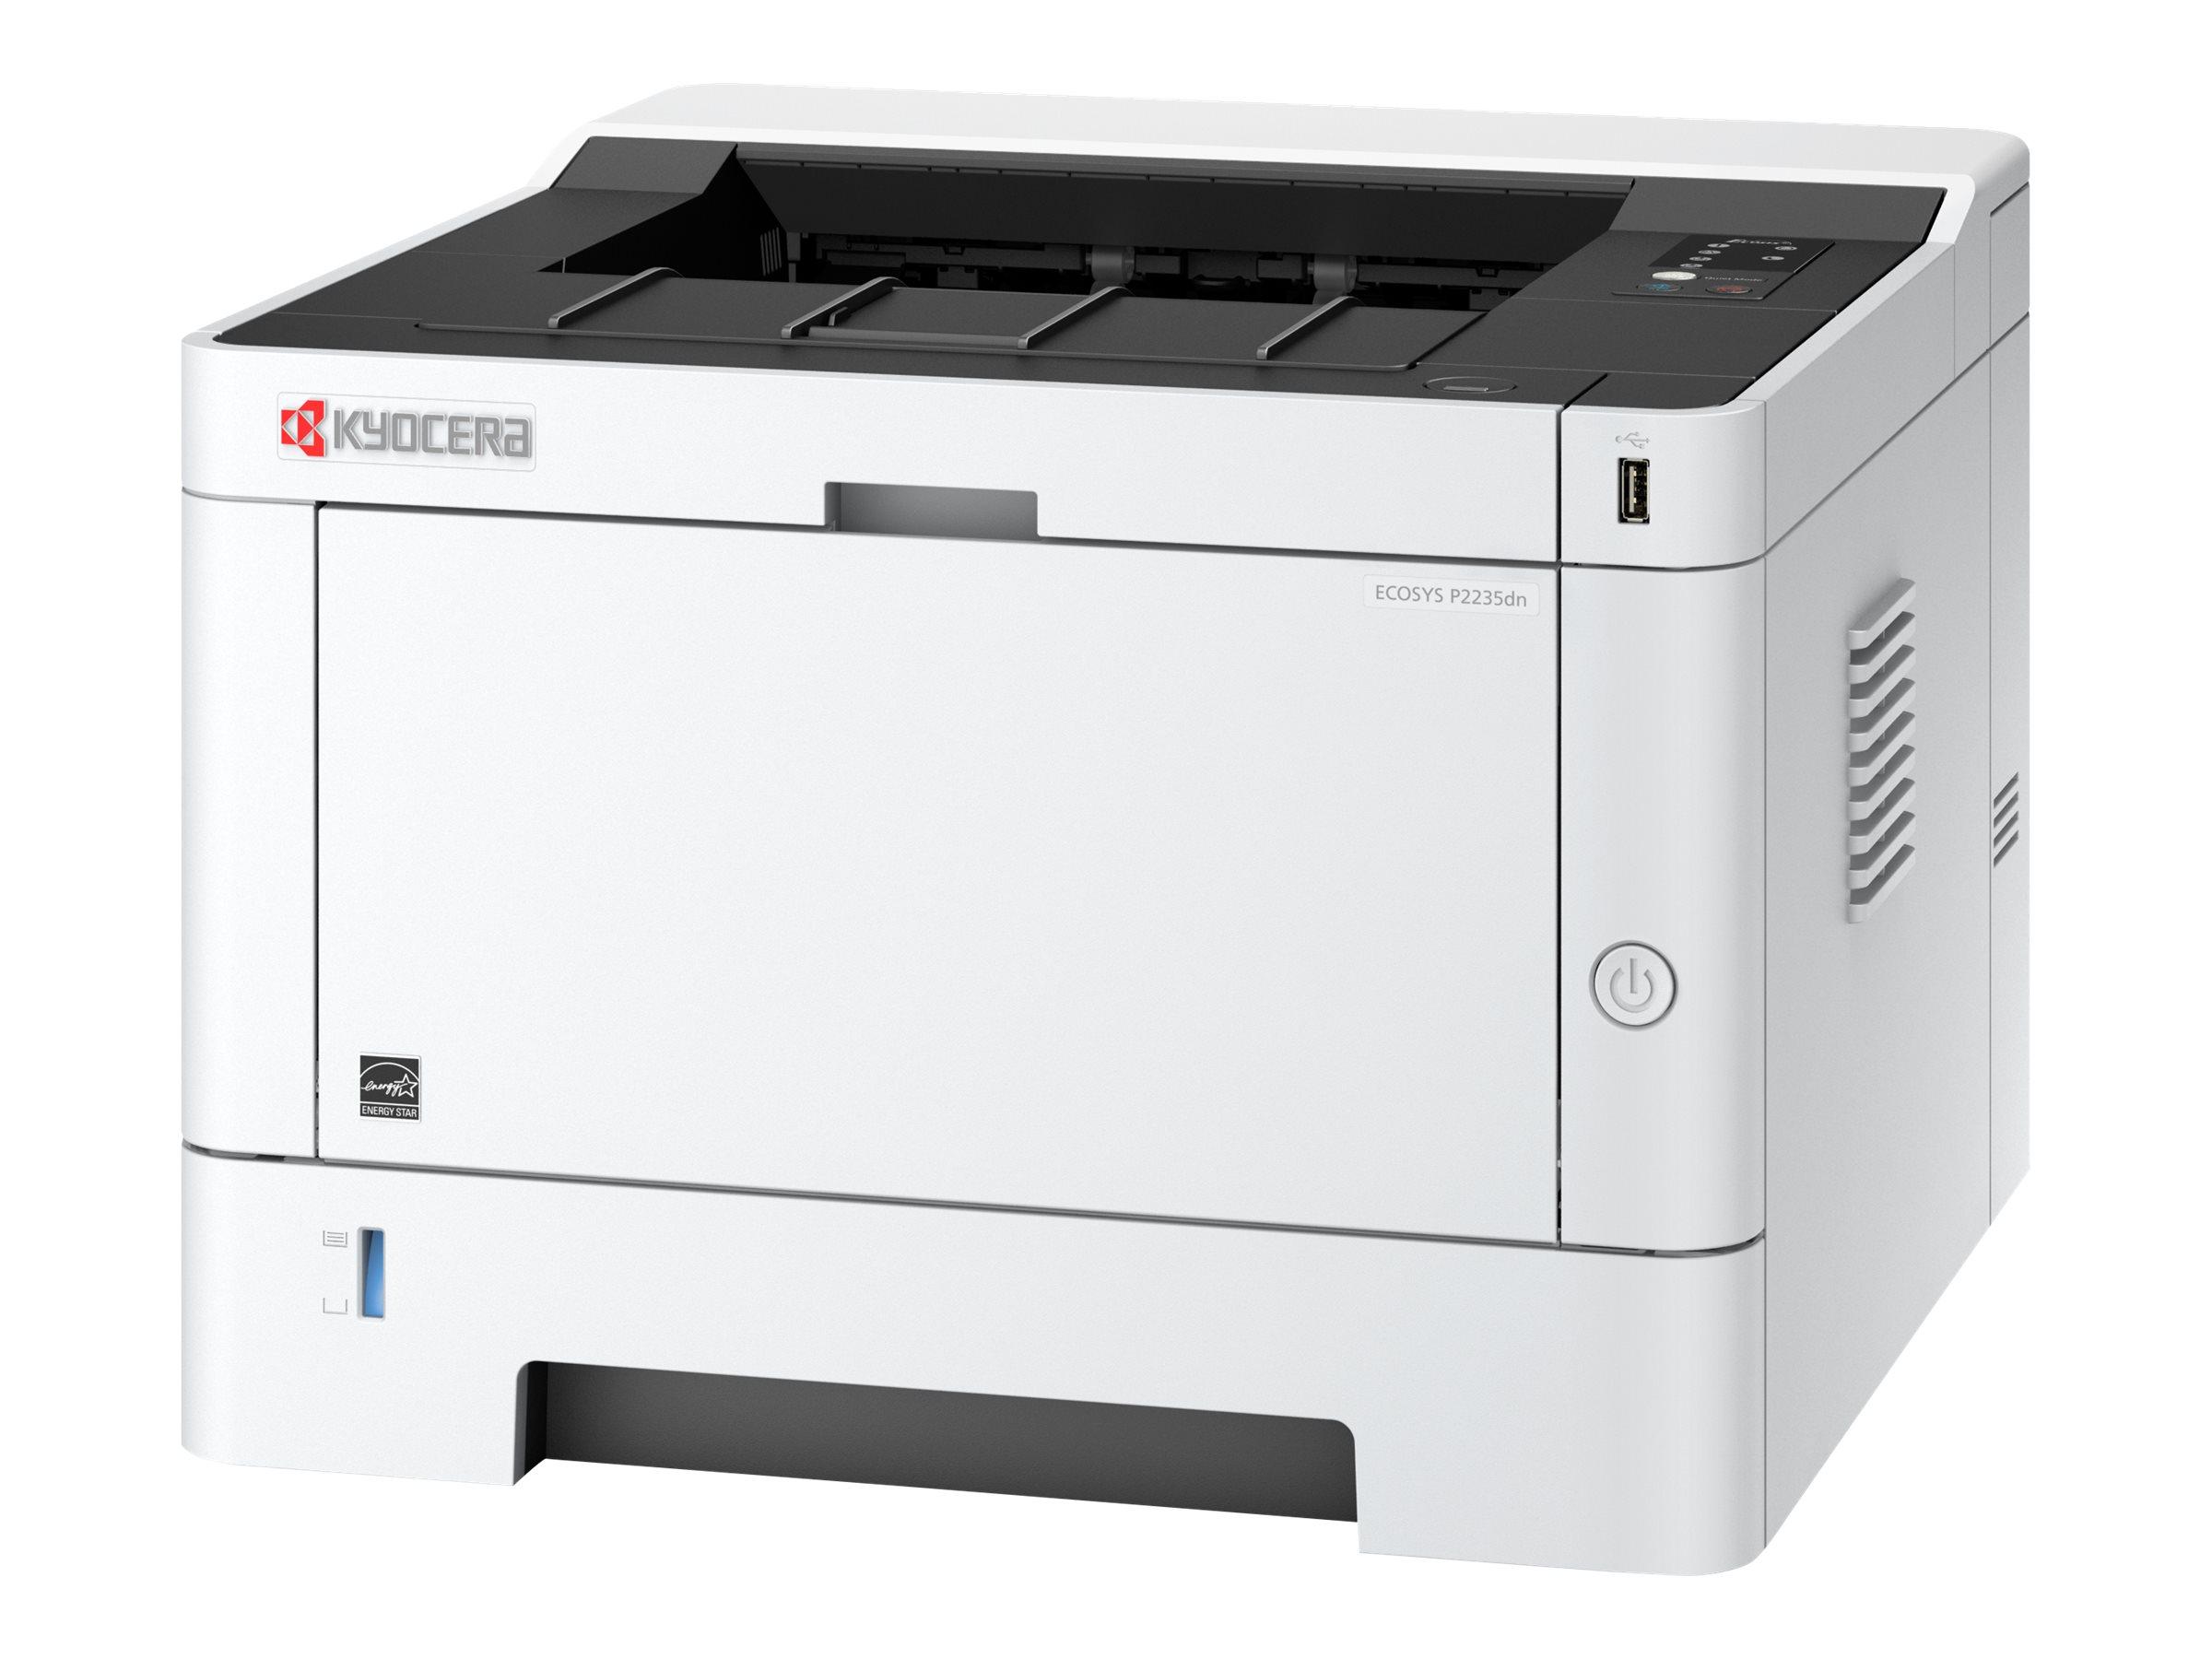 Kyocera ECOSYS P2235dn - Drucker - s/w - Duplex - Laser - A4/Legal